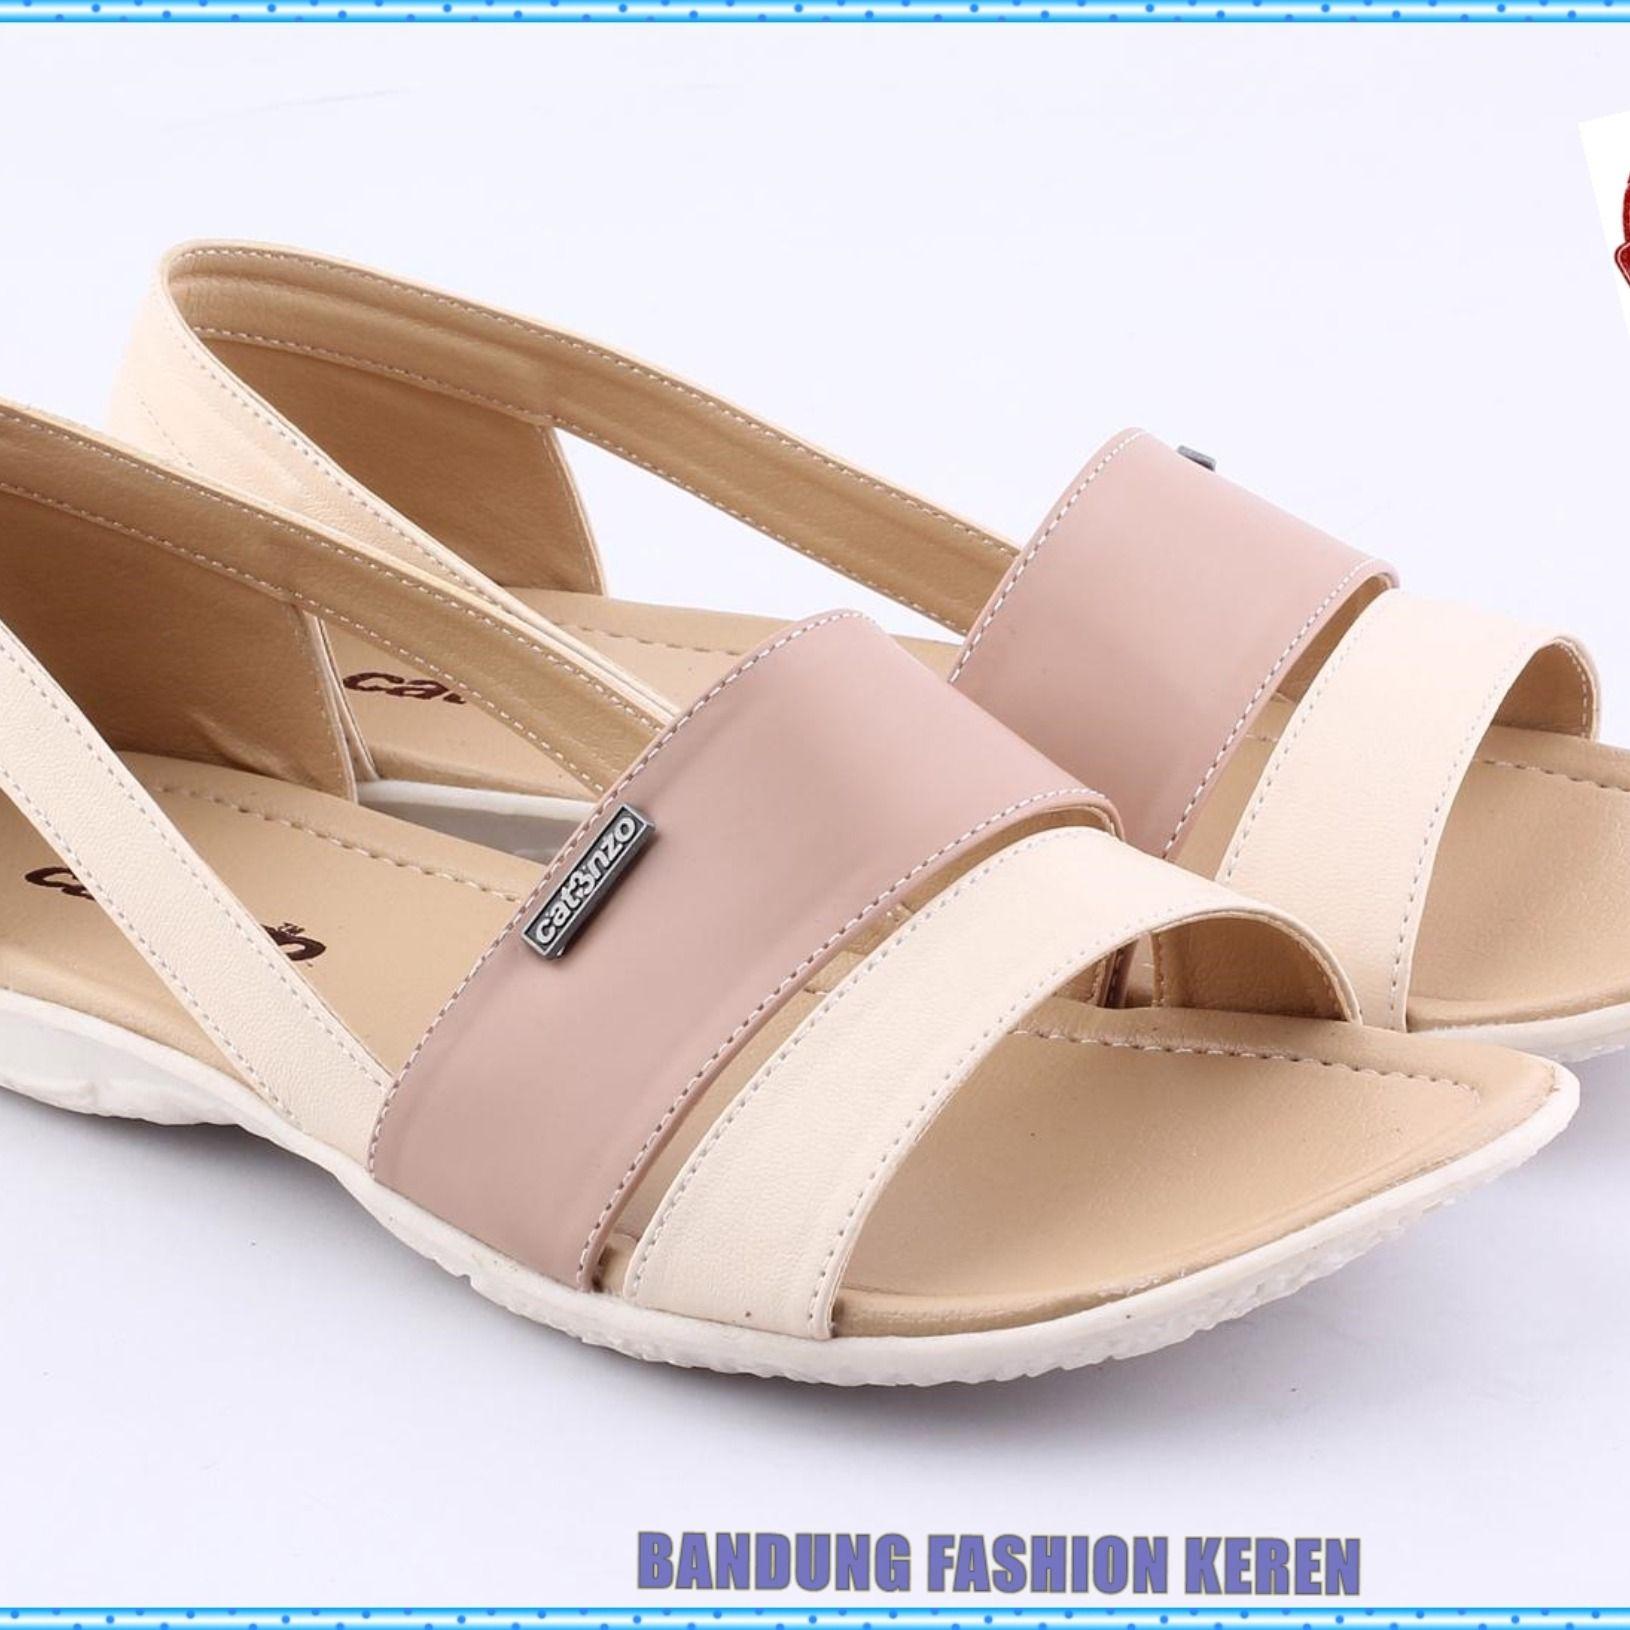 Sandal Casual Wanita As 403 Produk Fashion Handmade Terbaik 100